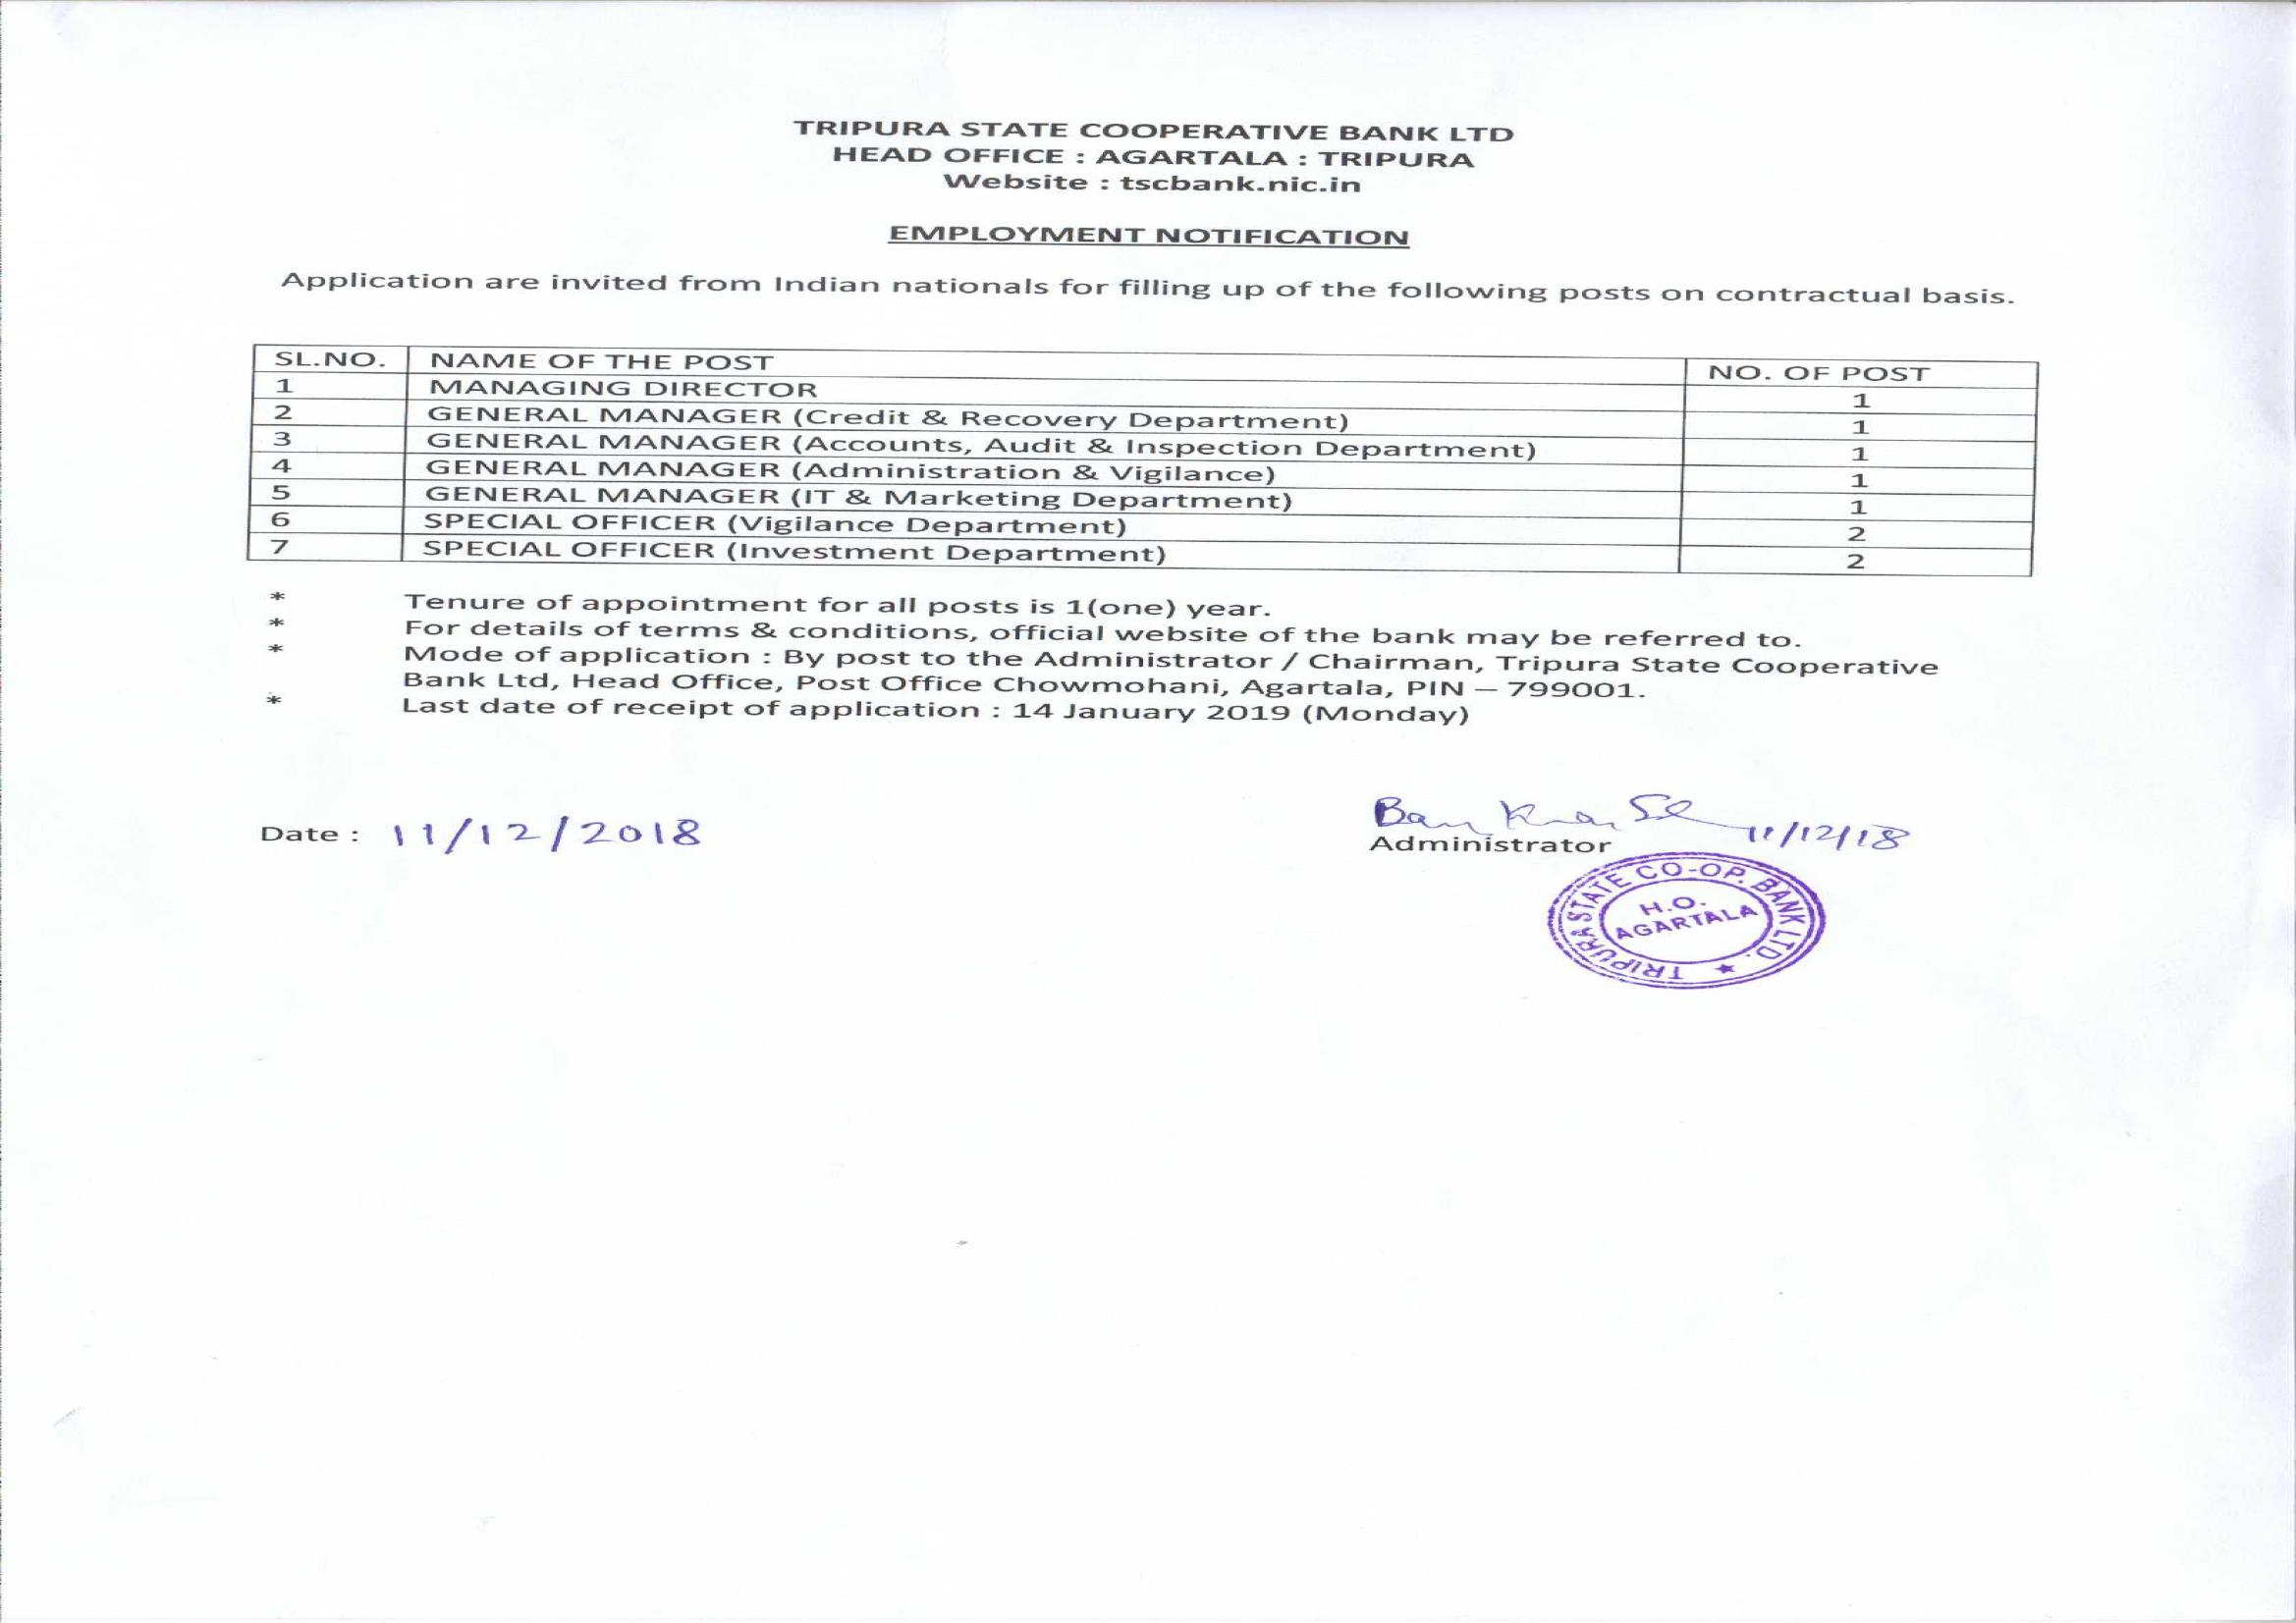 Welcome to Tripura State Co-Operative Bank Ltd